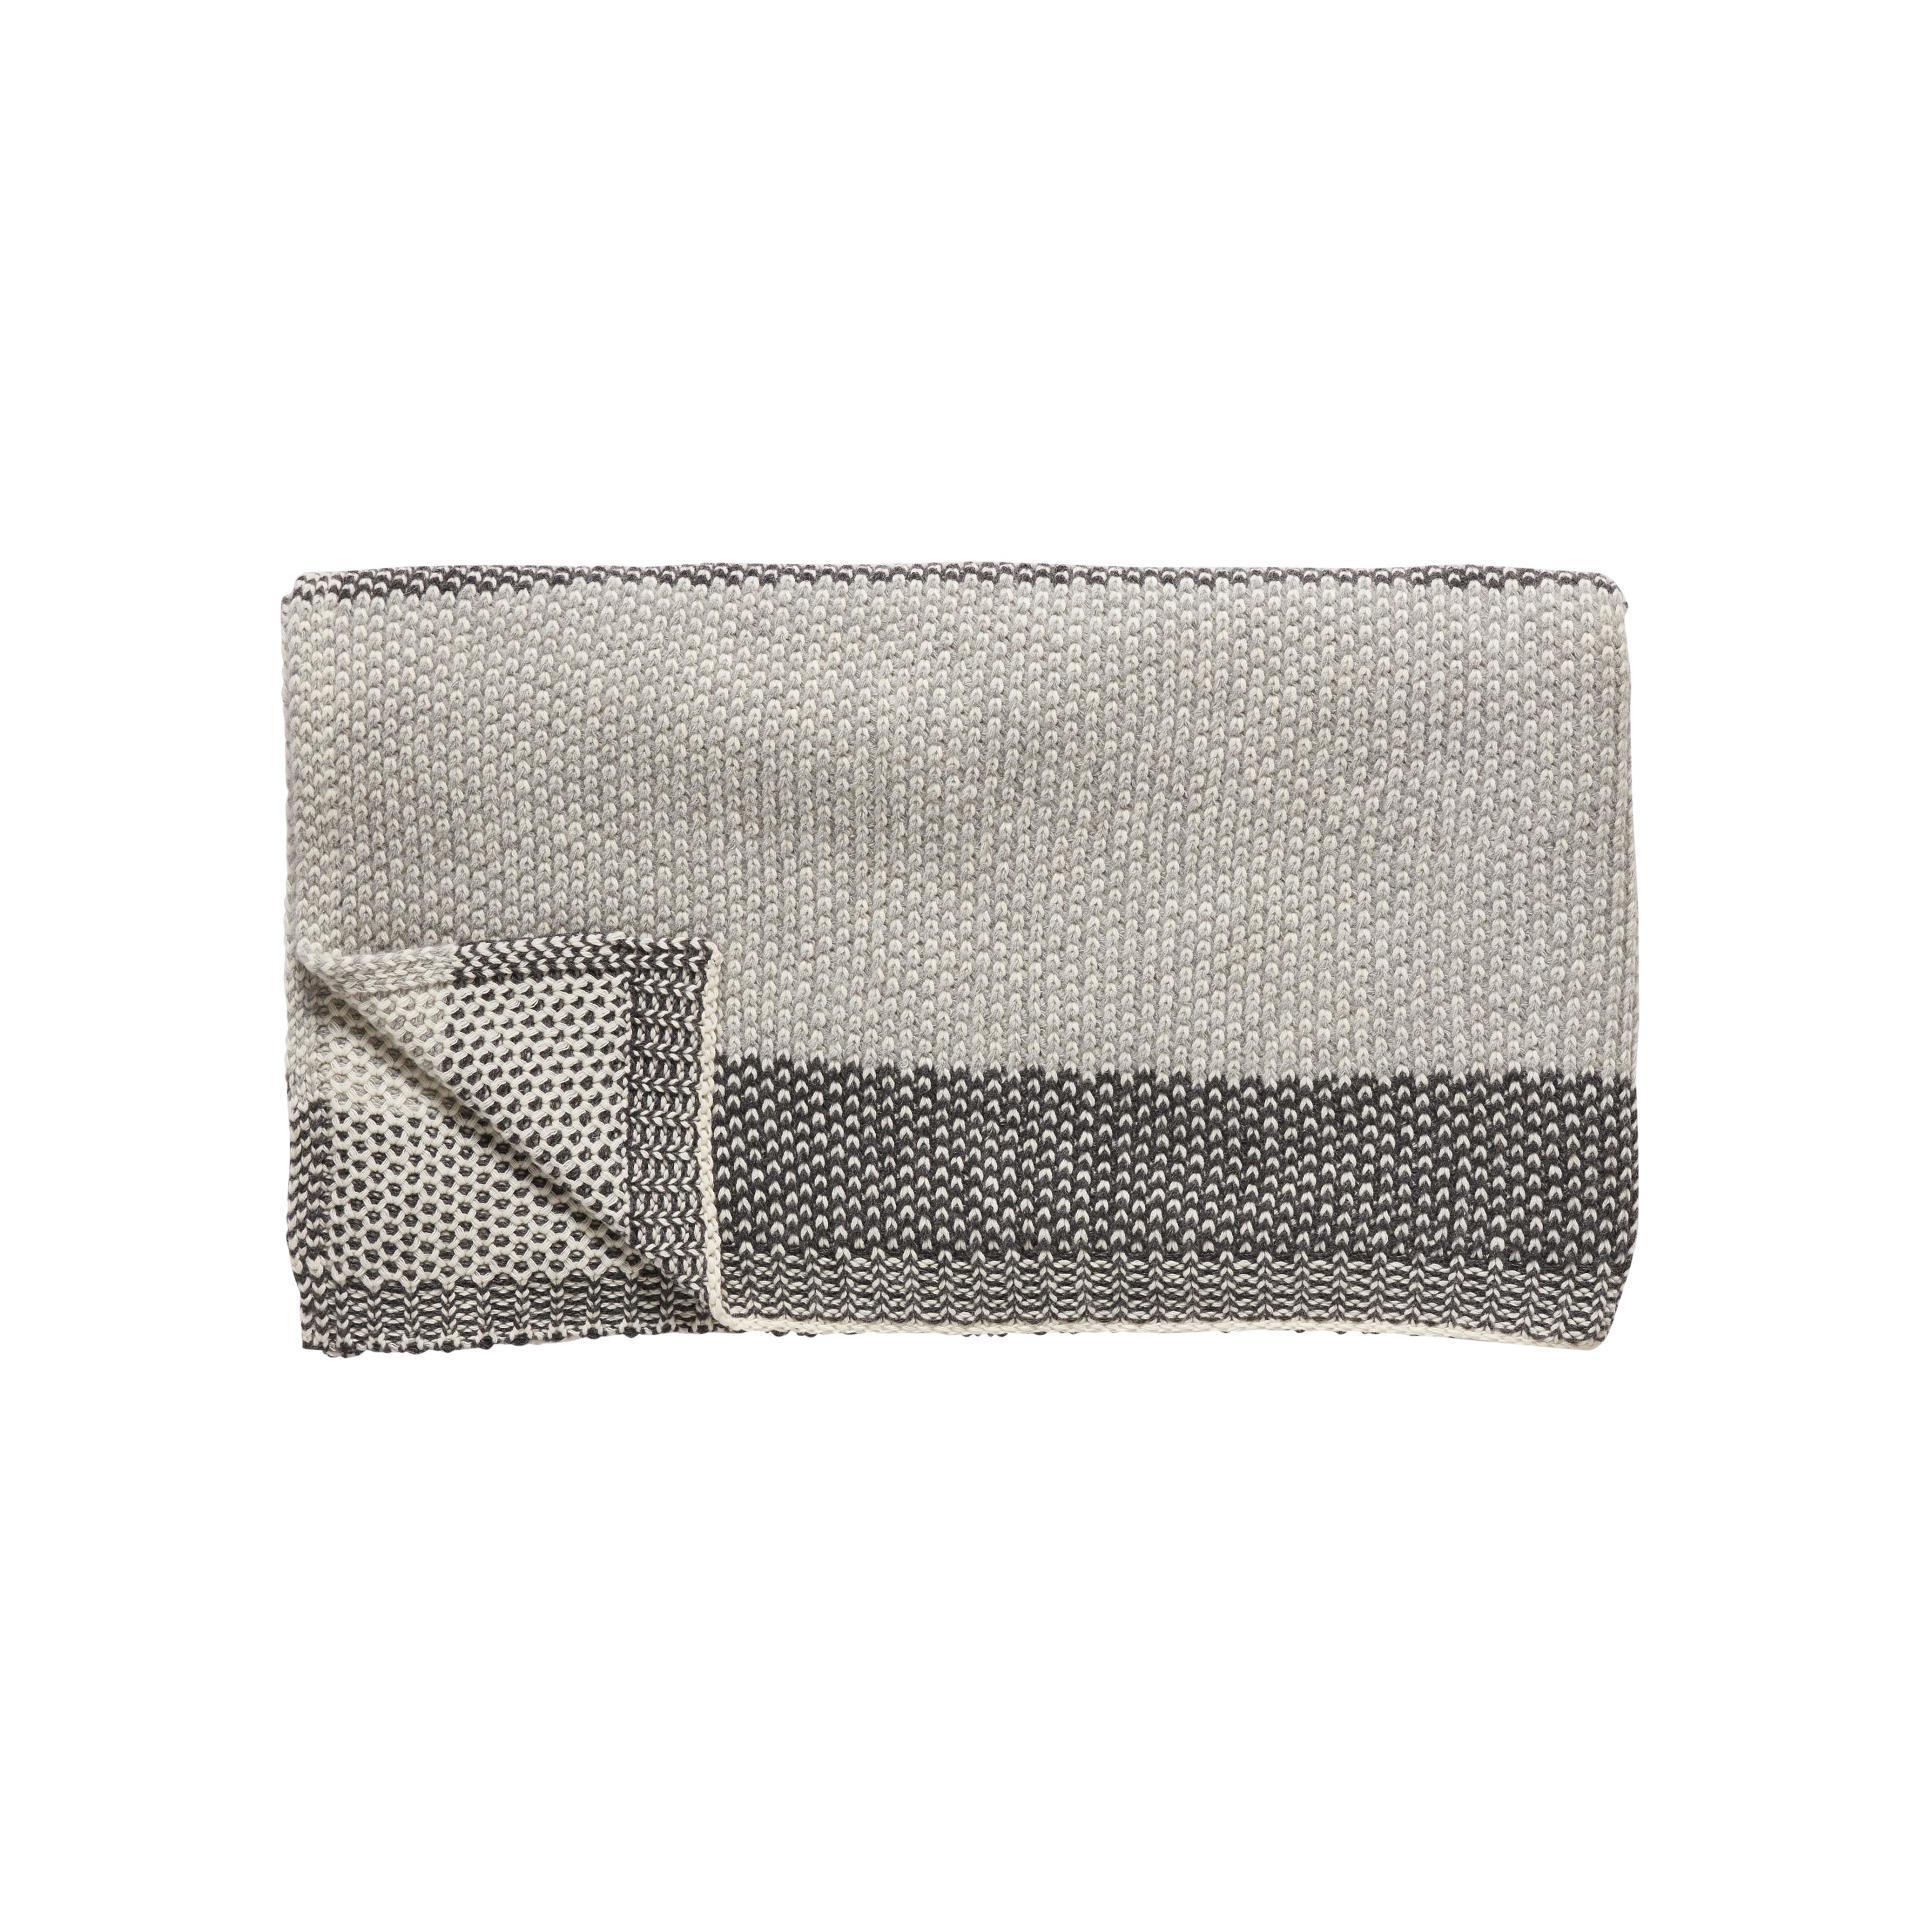 Hübsch Pletený pléd s ovčí vlnou Grey/nature 130x200, šedá barva, textil